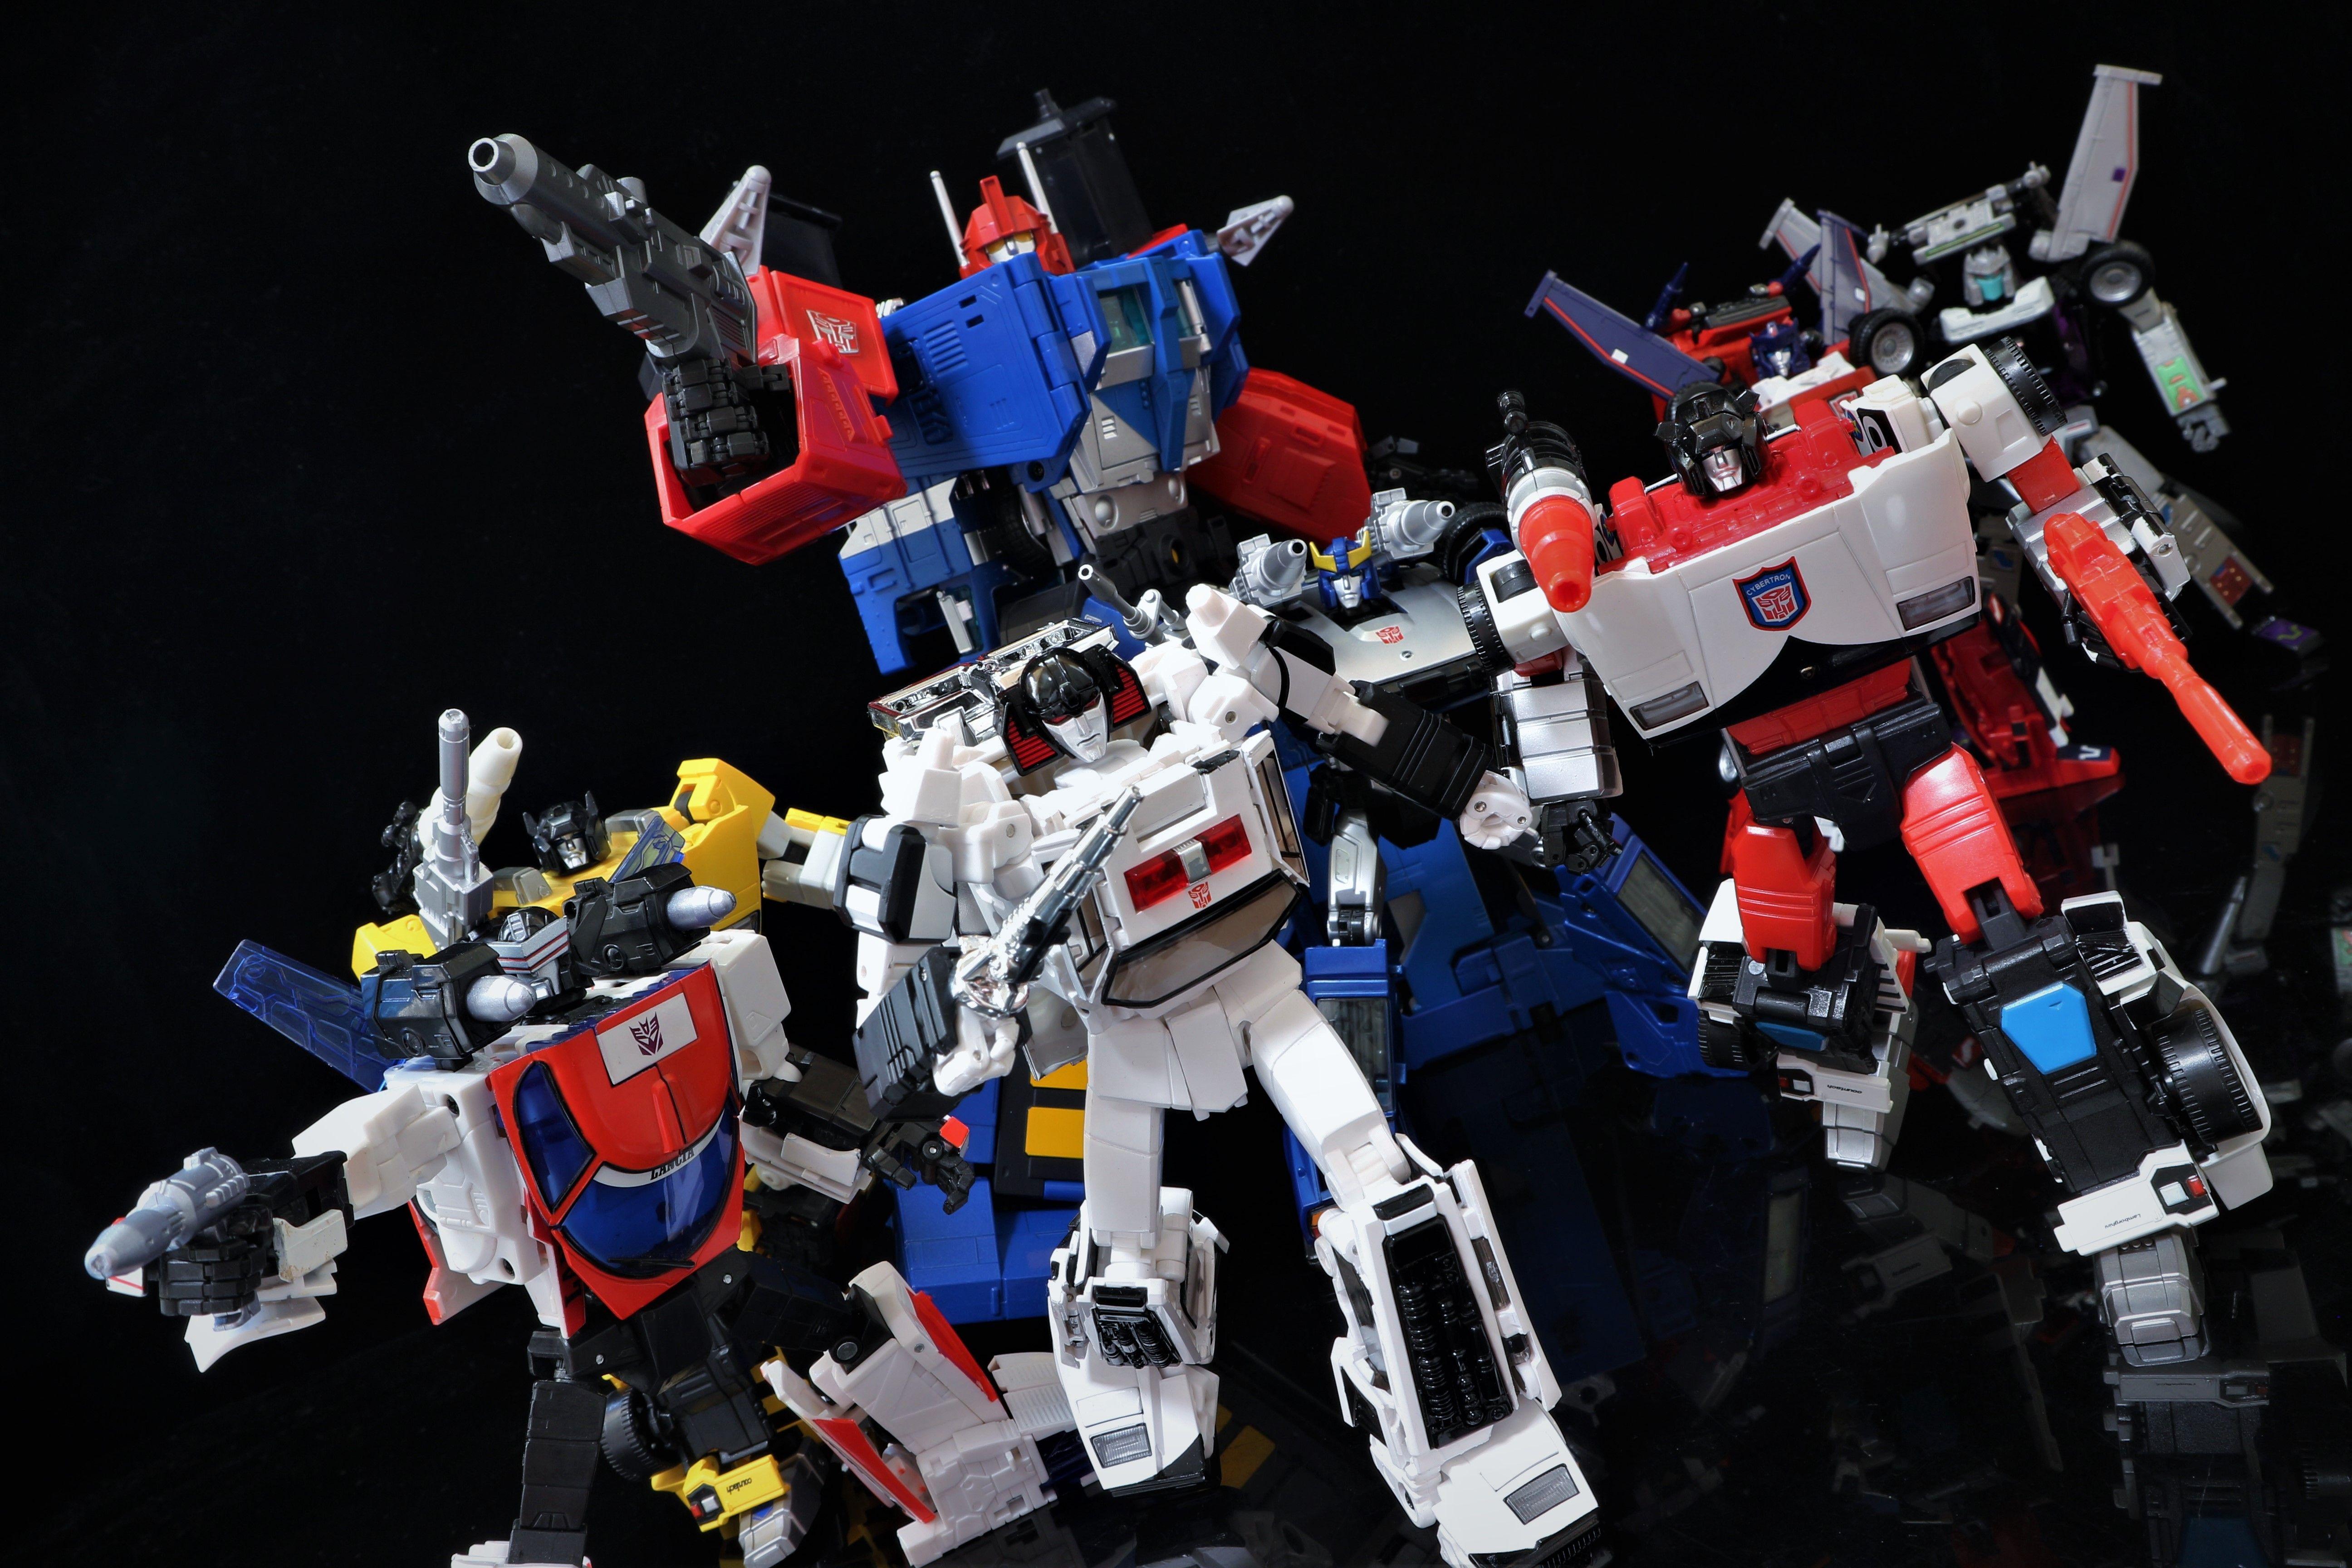 TAKARA TOMY Transformers Masterpiece MP-31 DELTA MAGNUS Action Figure F//S japan